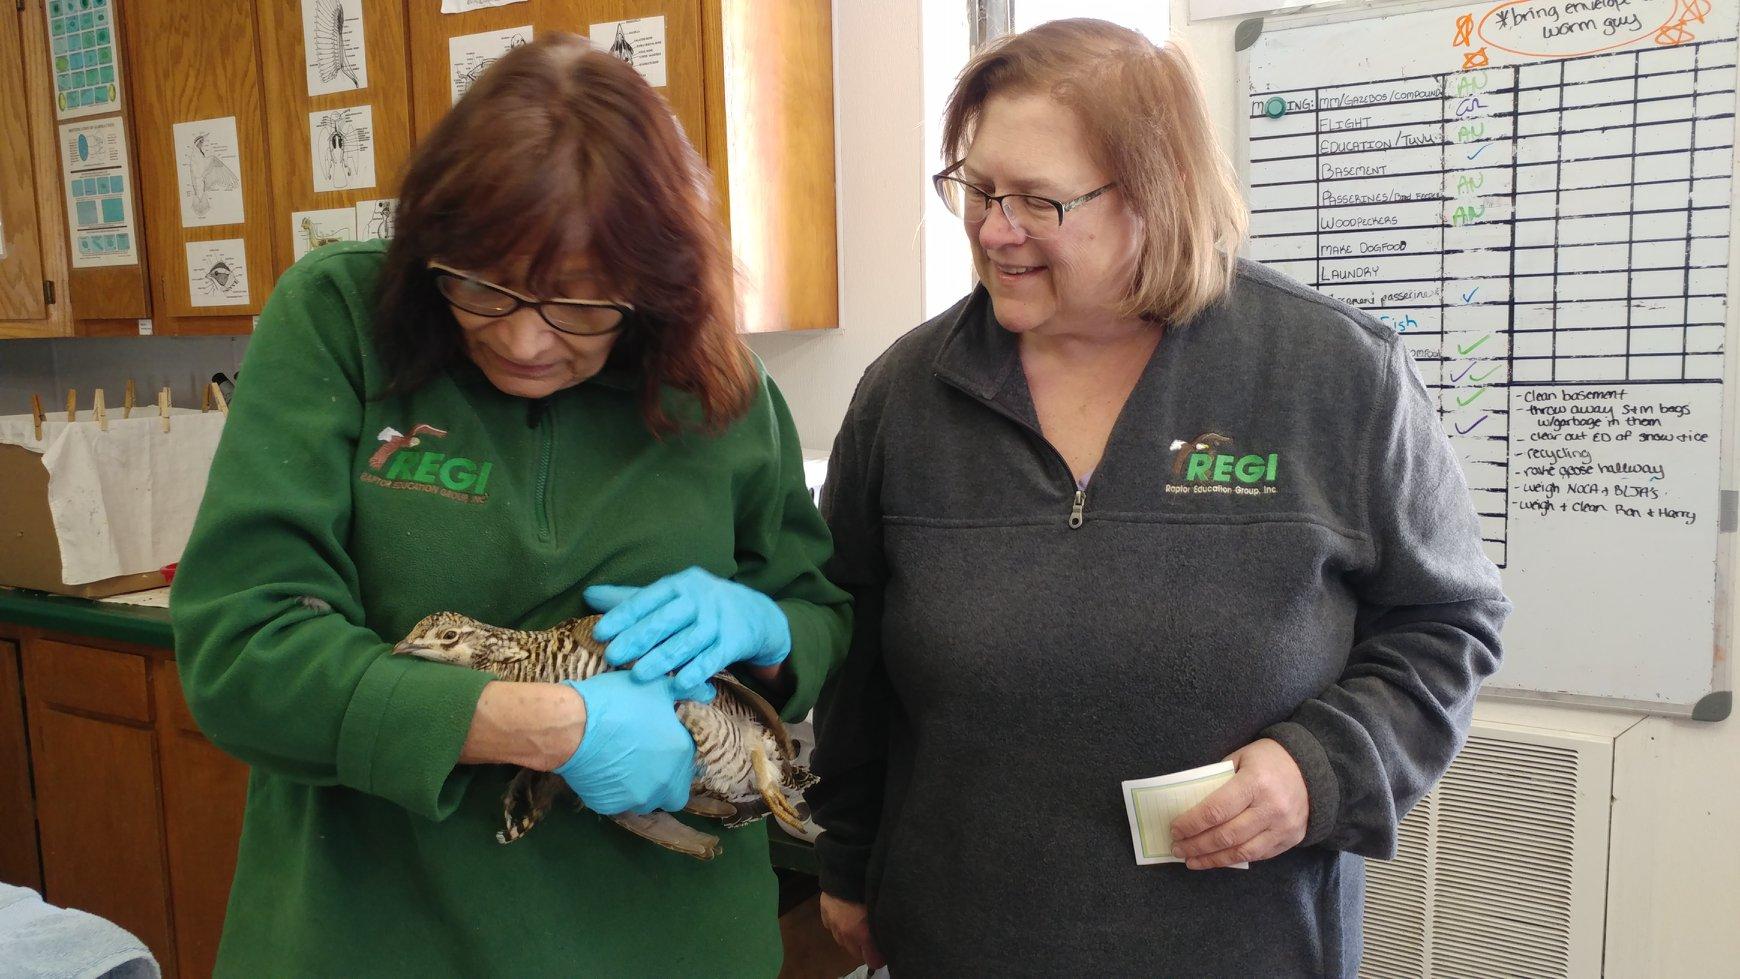 REGI volunteer Kathy Esqueda transported the Prairie Chicken to REGI for care after she was injured.